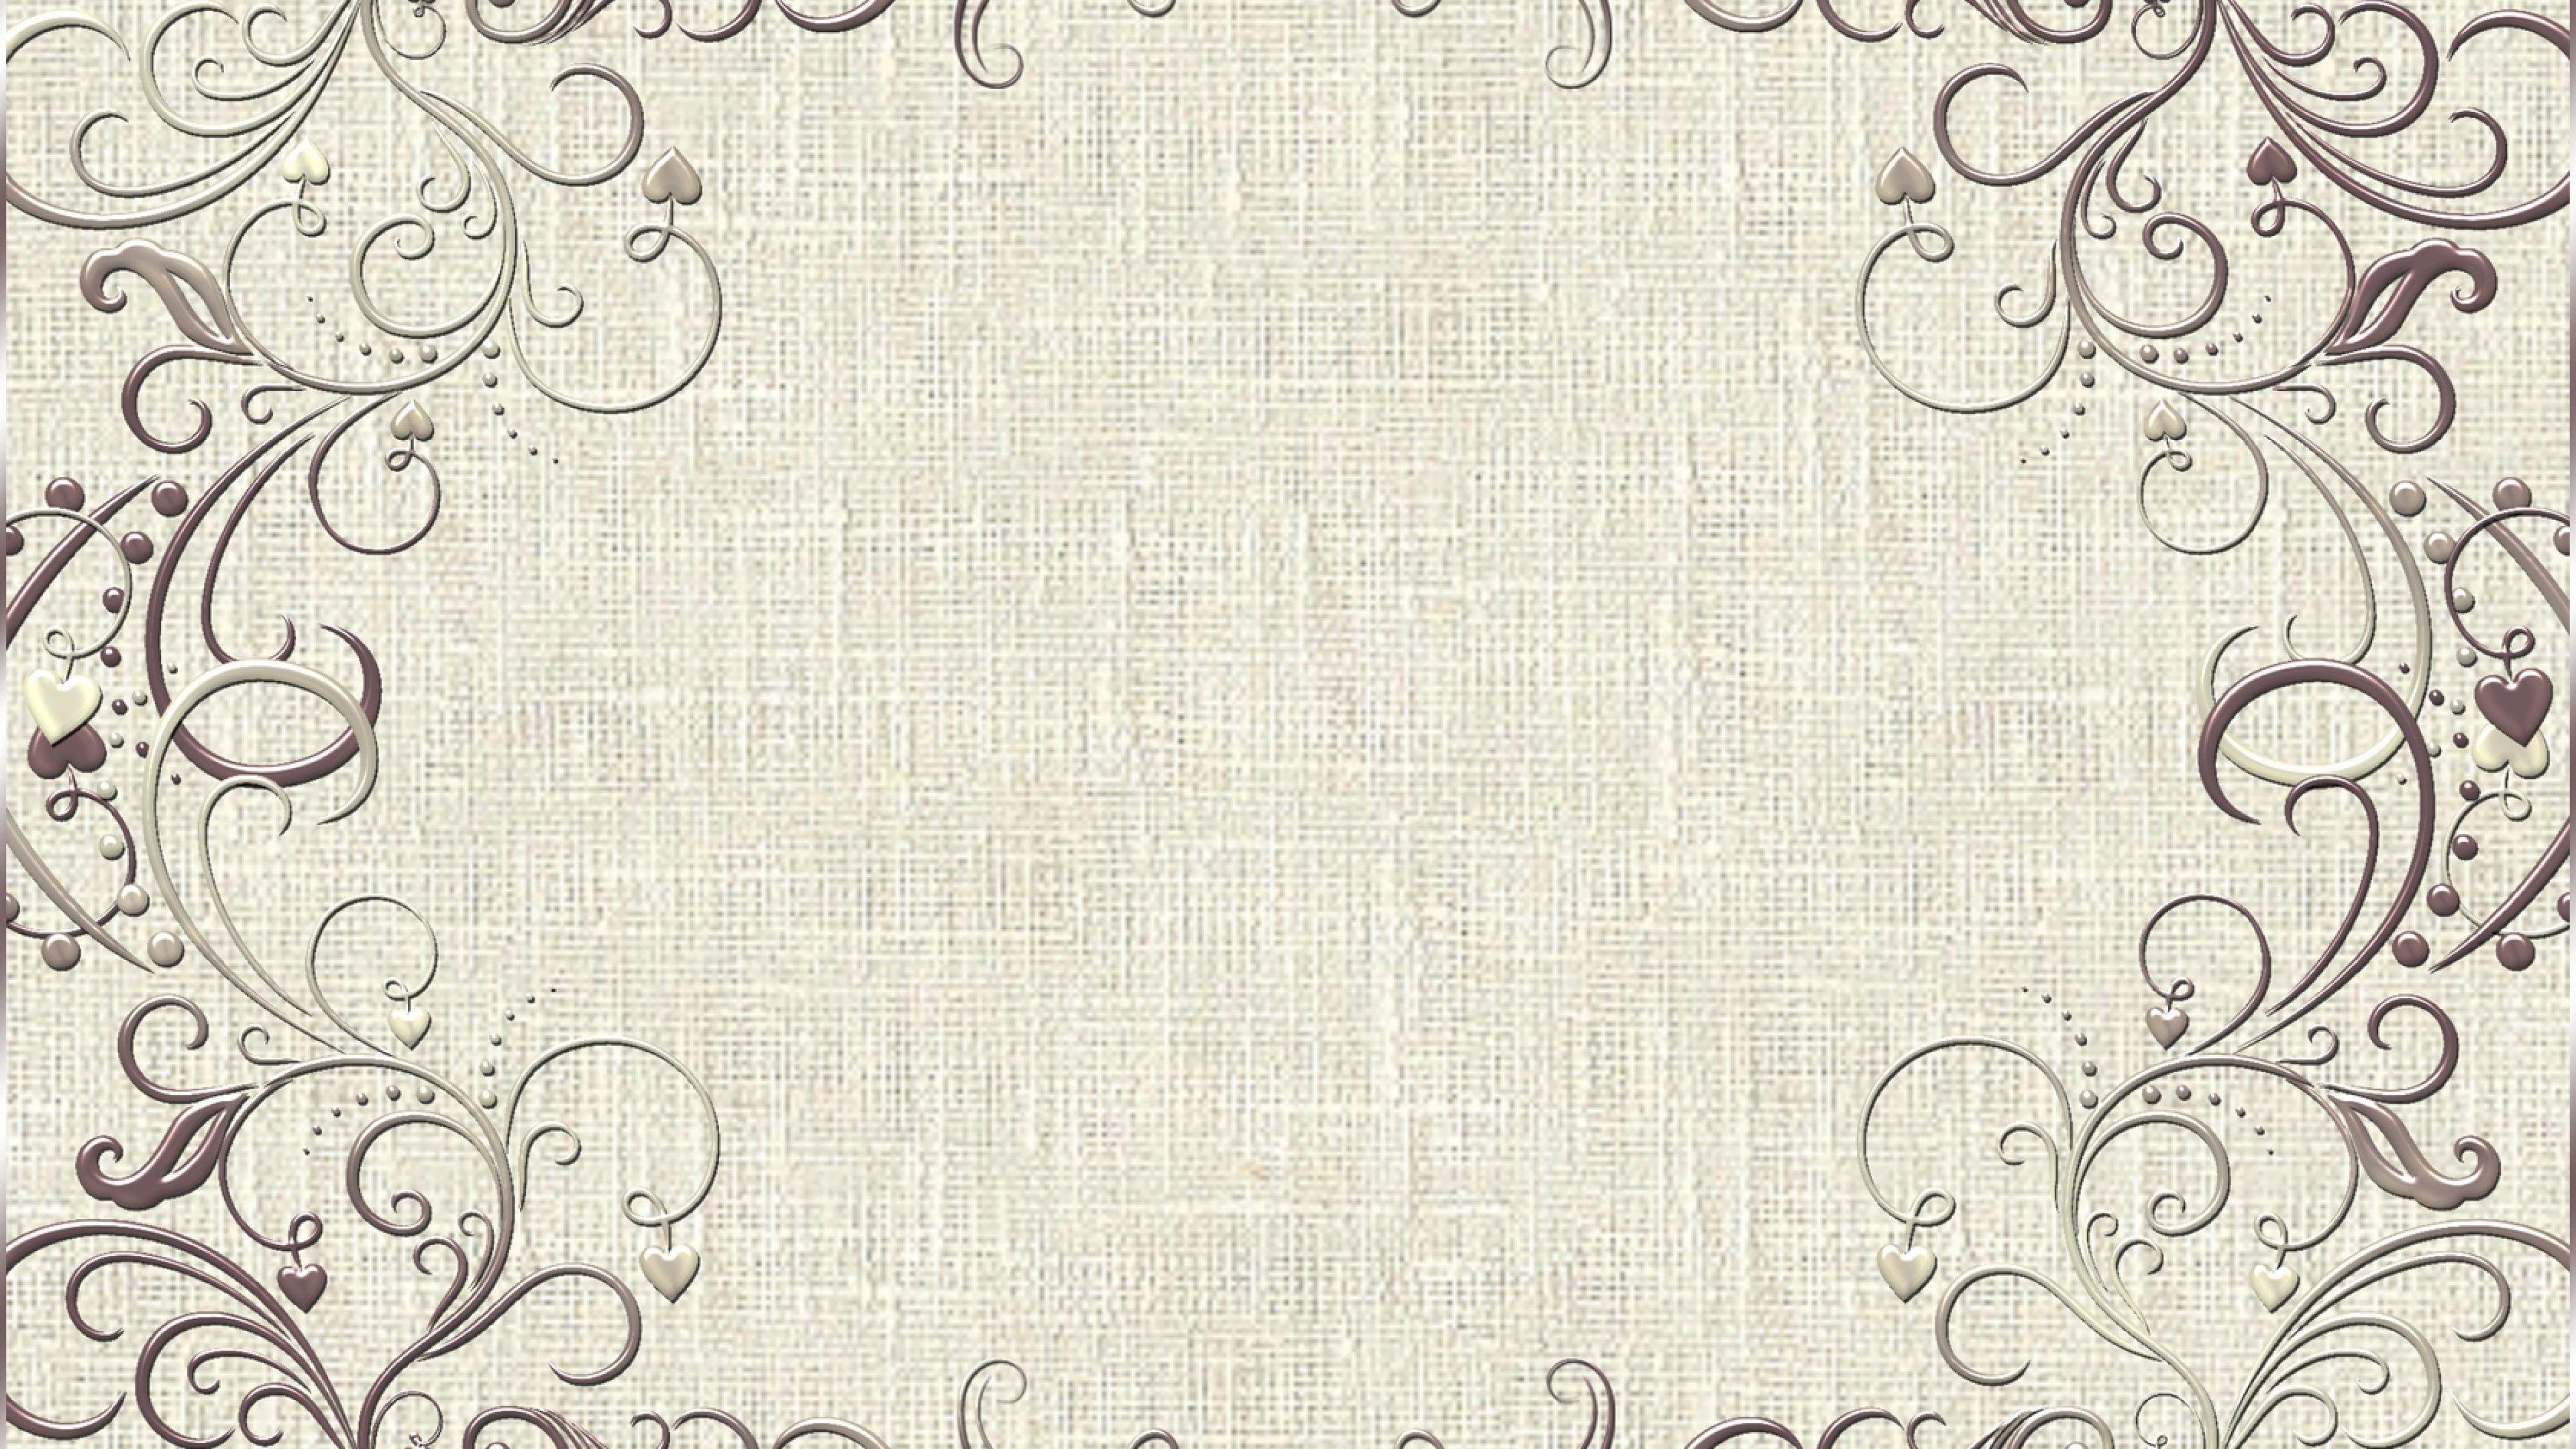 background vintage frame design pattern wallpaper wallpapers byte 3840x2160